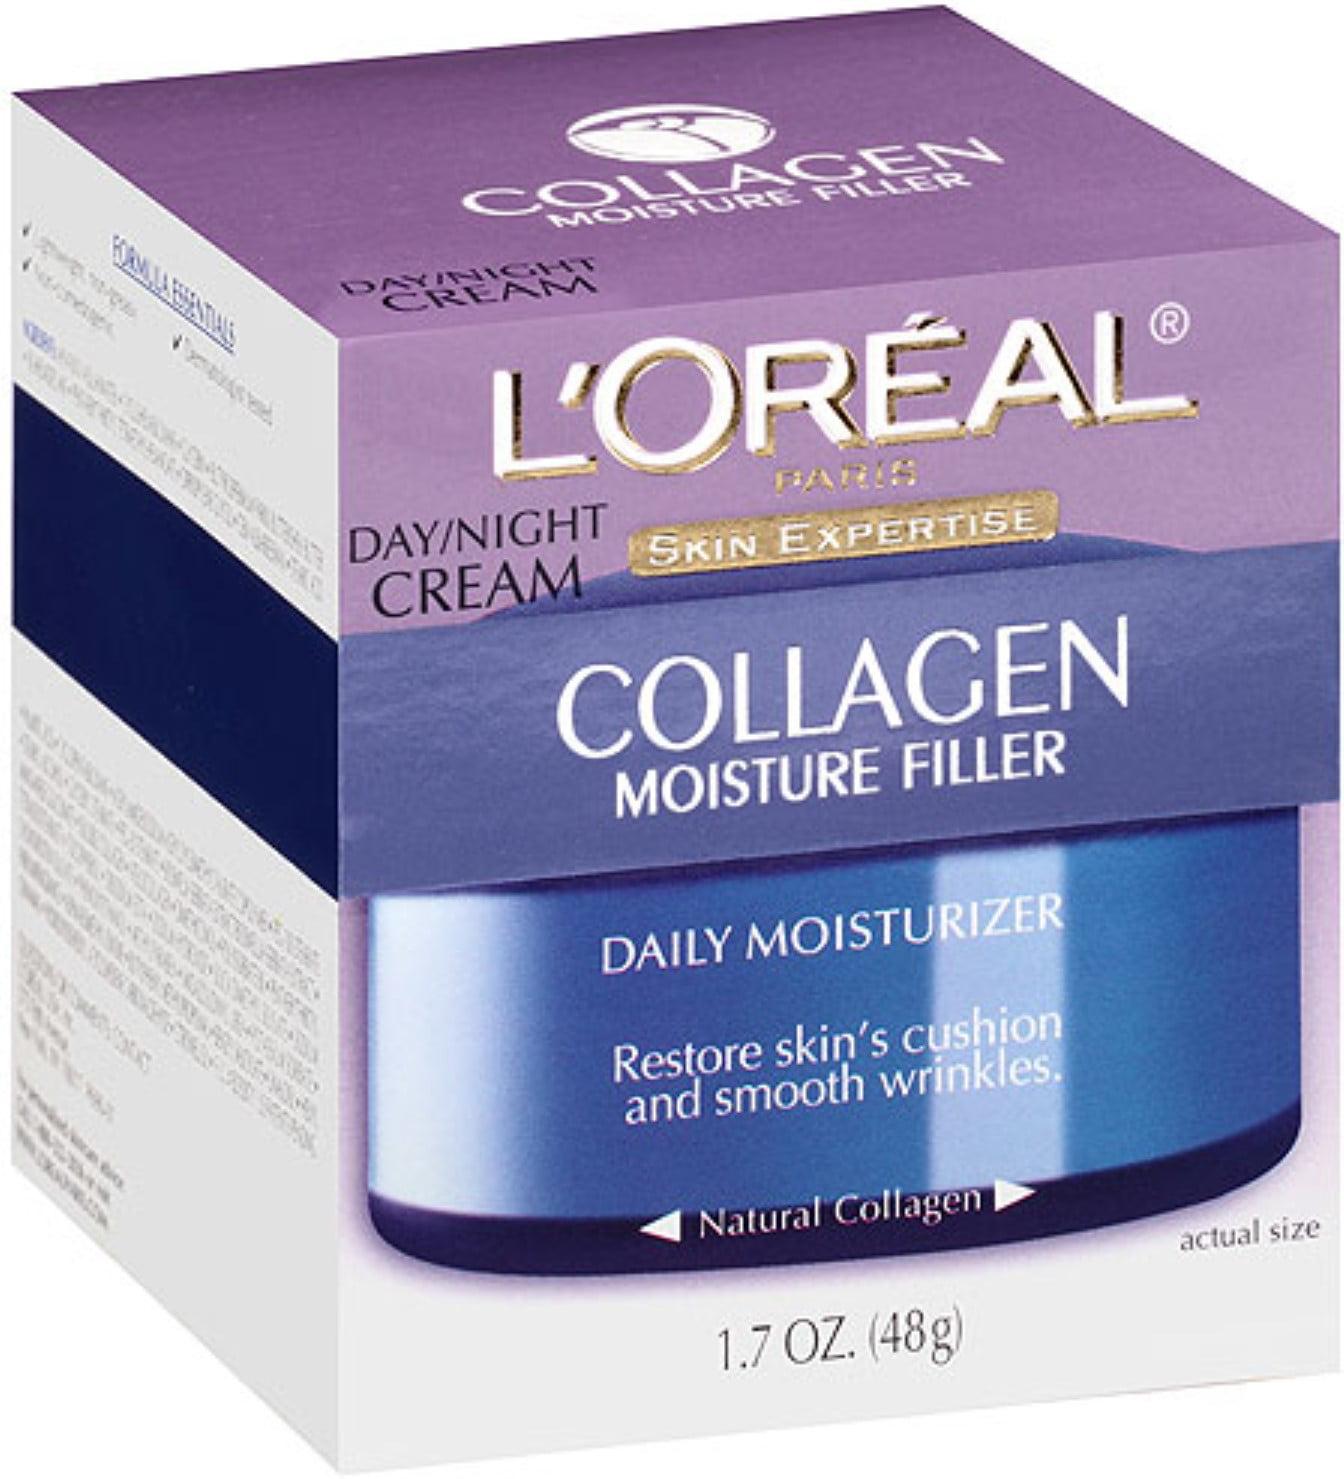 L'Oreal Paris Skin Expertise Collagen Moisture Filler Daily Moisturizer Day/Night Cream 1.7 oz (Pack of 3)